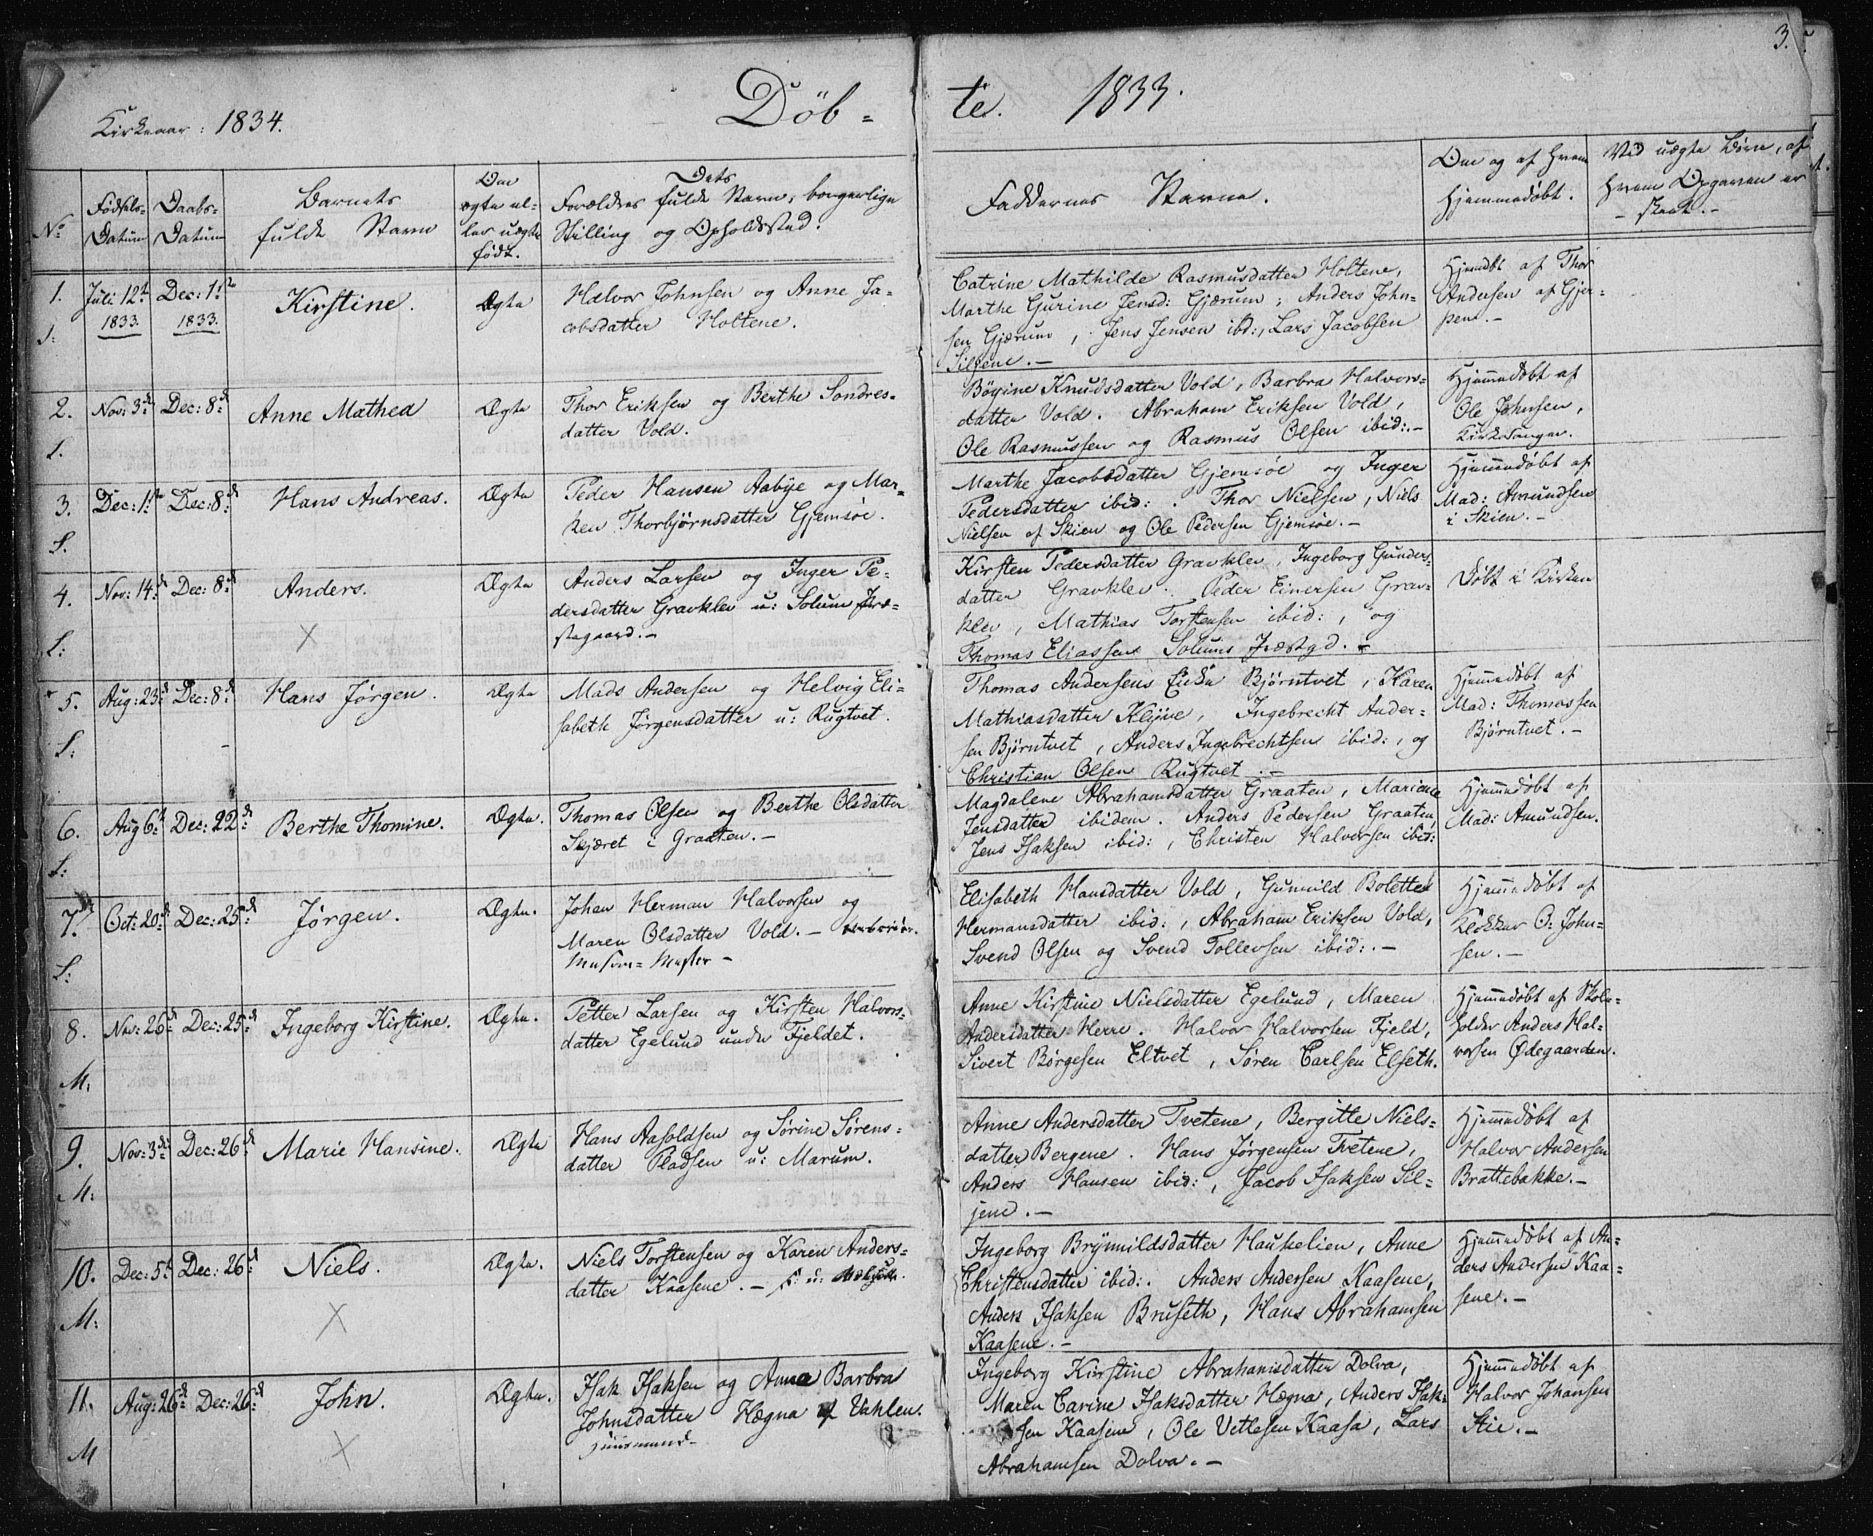 SAKO, Solum kirkebøker, F/Fa/L0005: Ministerialbok nr. I 5, 1833-1843, s. 3